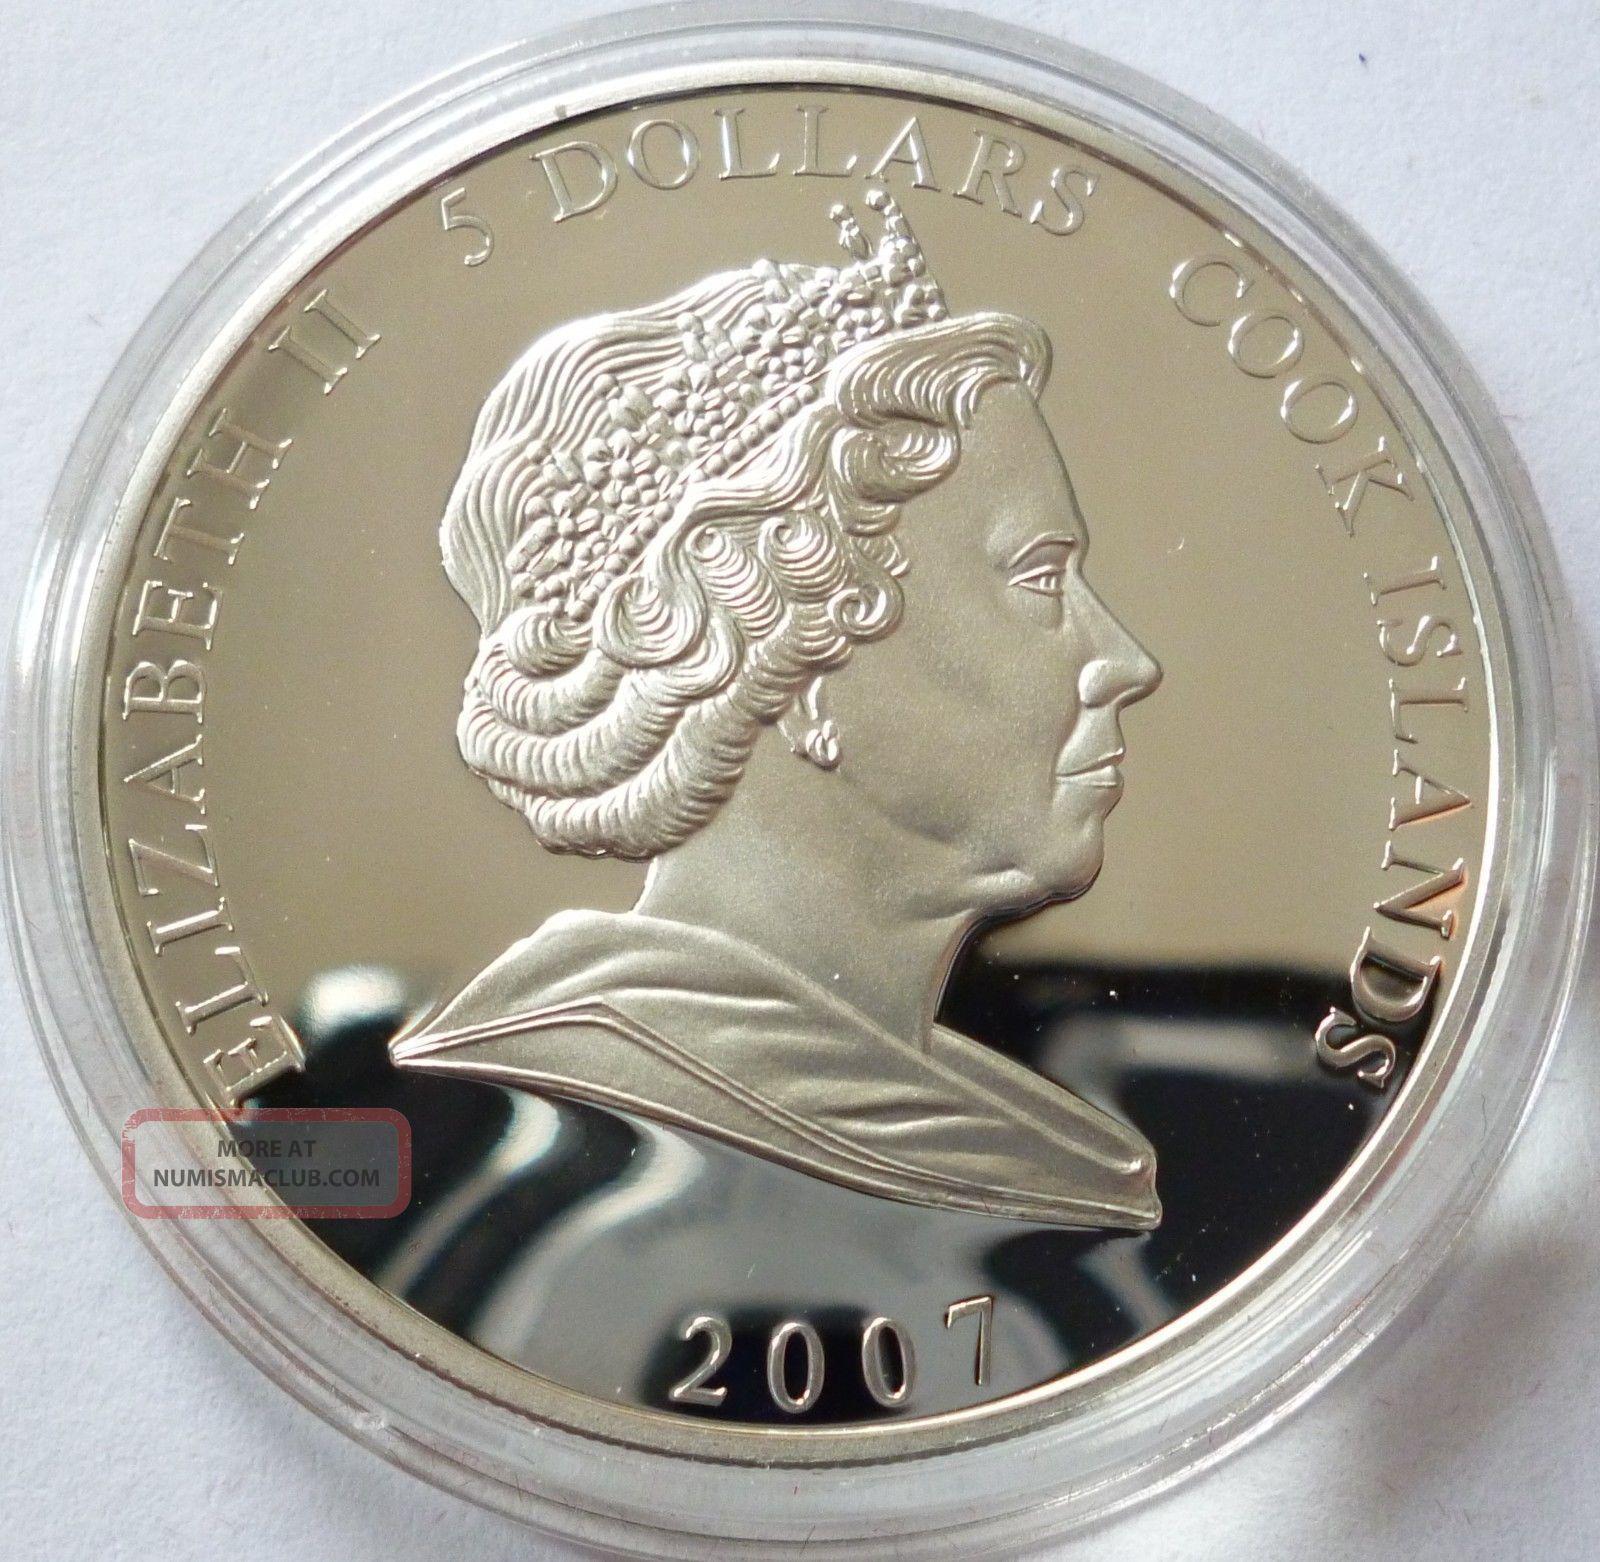 Cook Islands 5 Dollars 2007 Silver Coin Proof Elvis